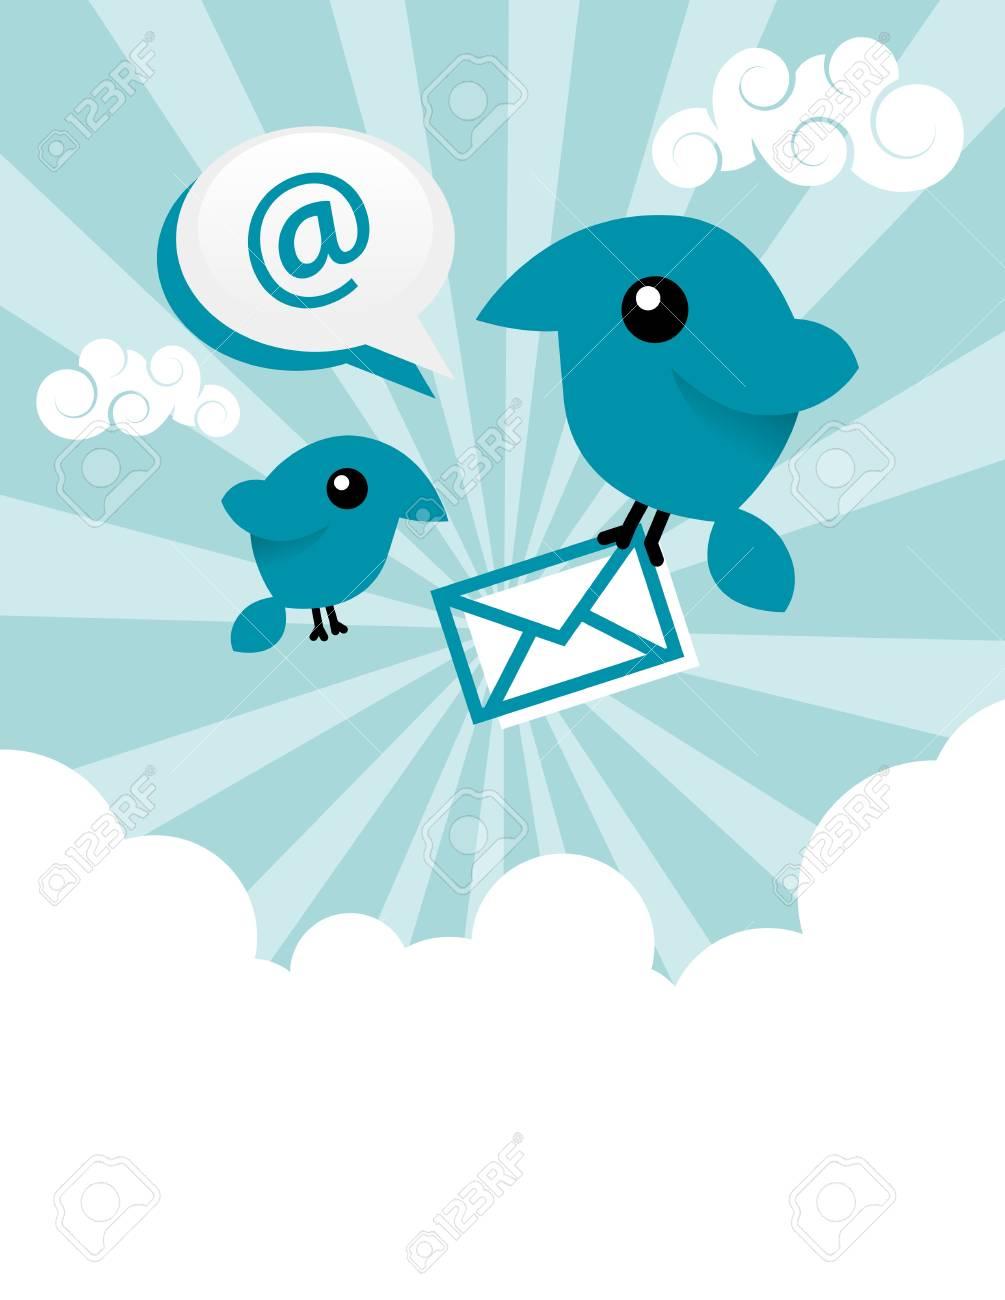 Vector illustration of blue birds sharing emails. Stock Vector - 14293950